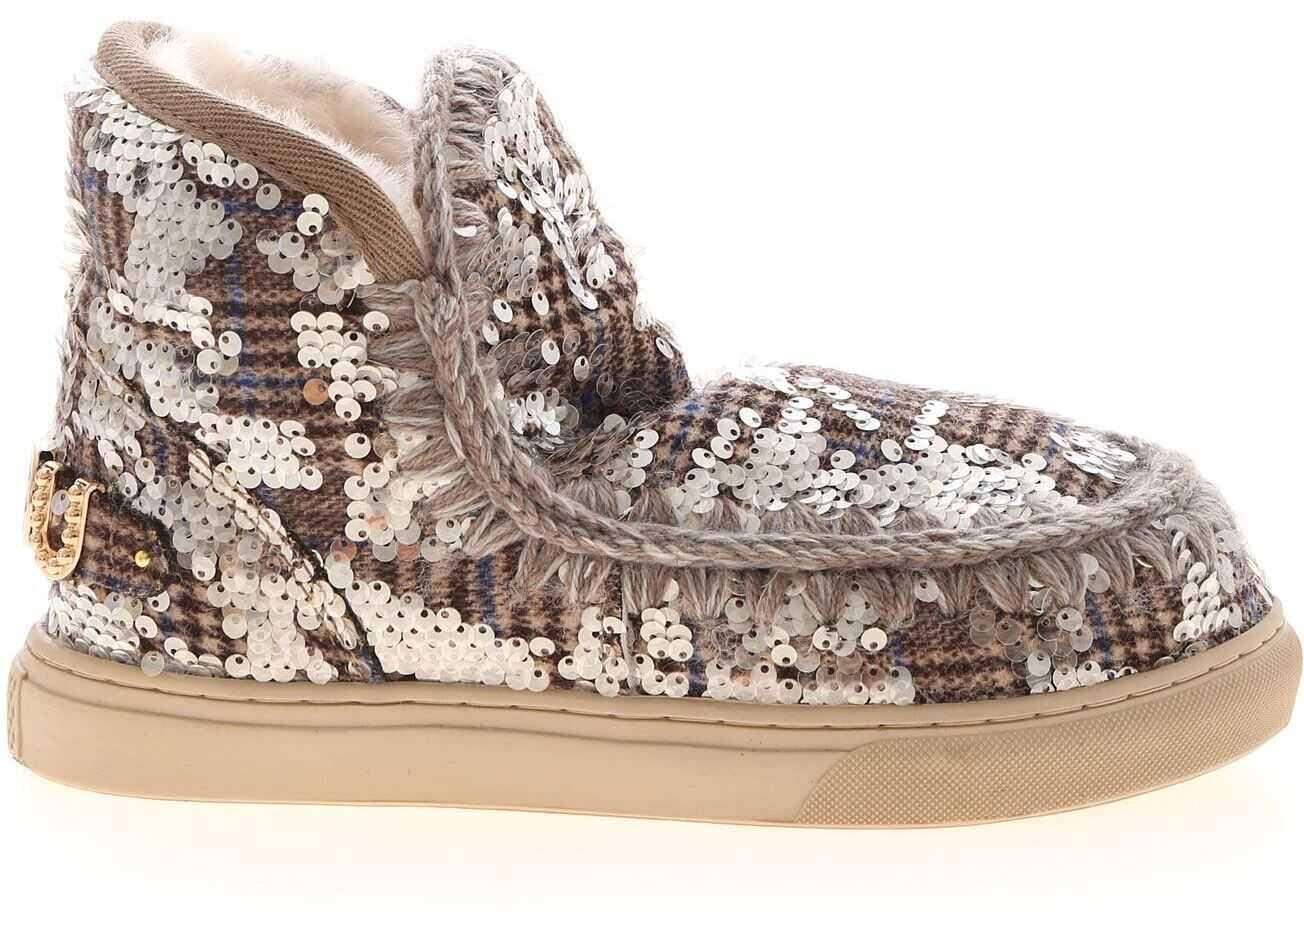 Mou Wool Plaid And Sequins Sneakers In Brown MU.FW111018K TASQBE Beige imagine b-mall.ro